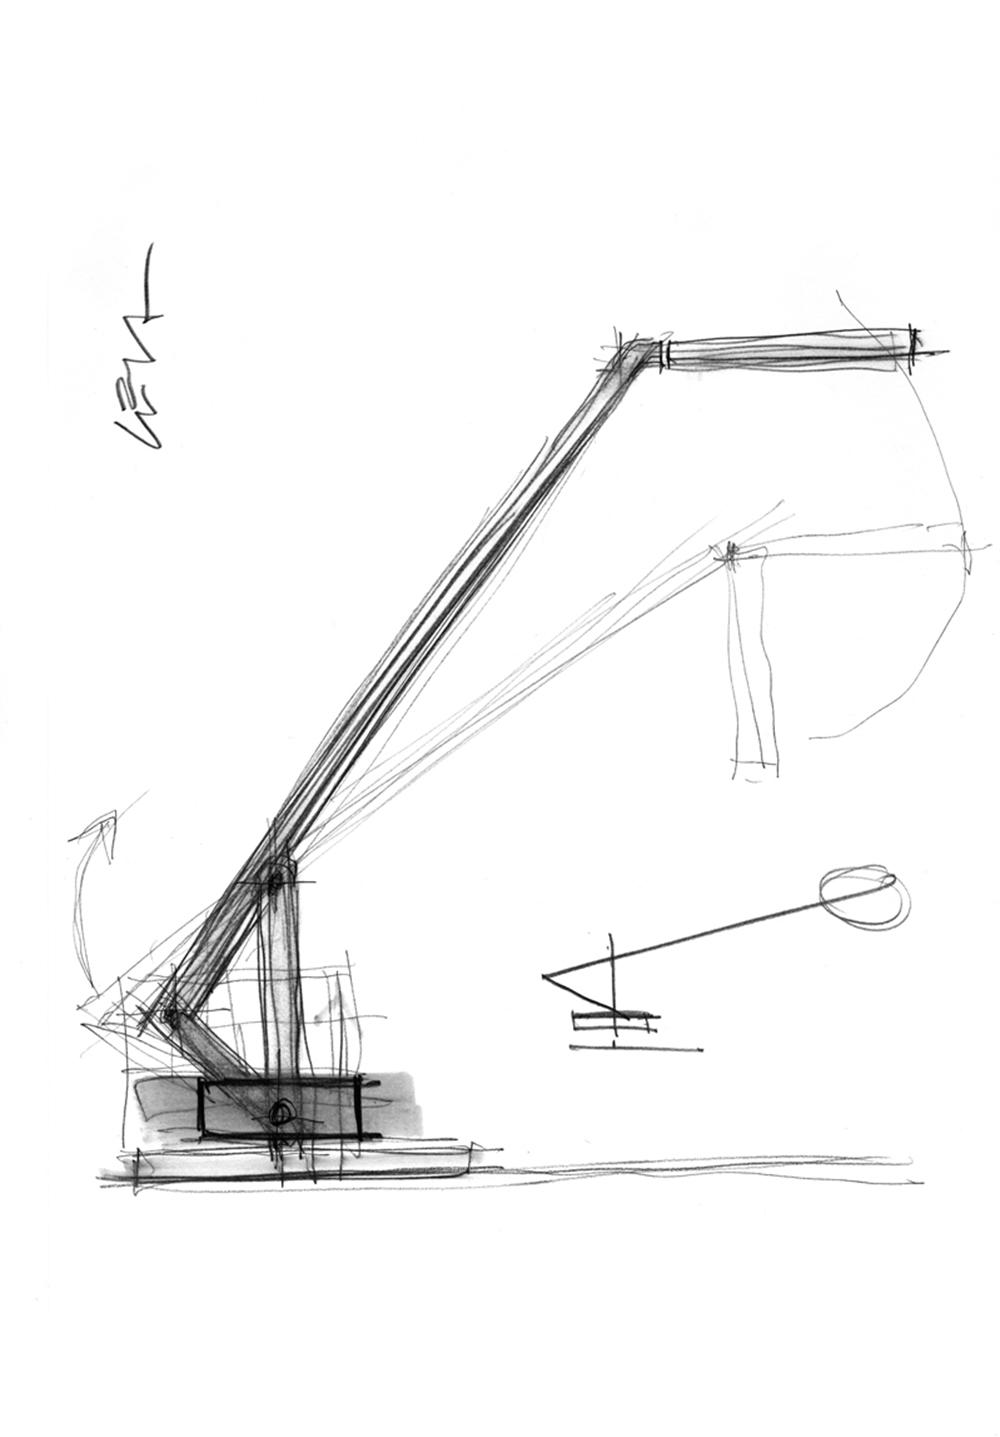 Studio per lampada Leva, 2012, tecnica mista su carta, cm 29.7x21